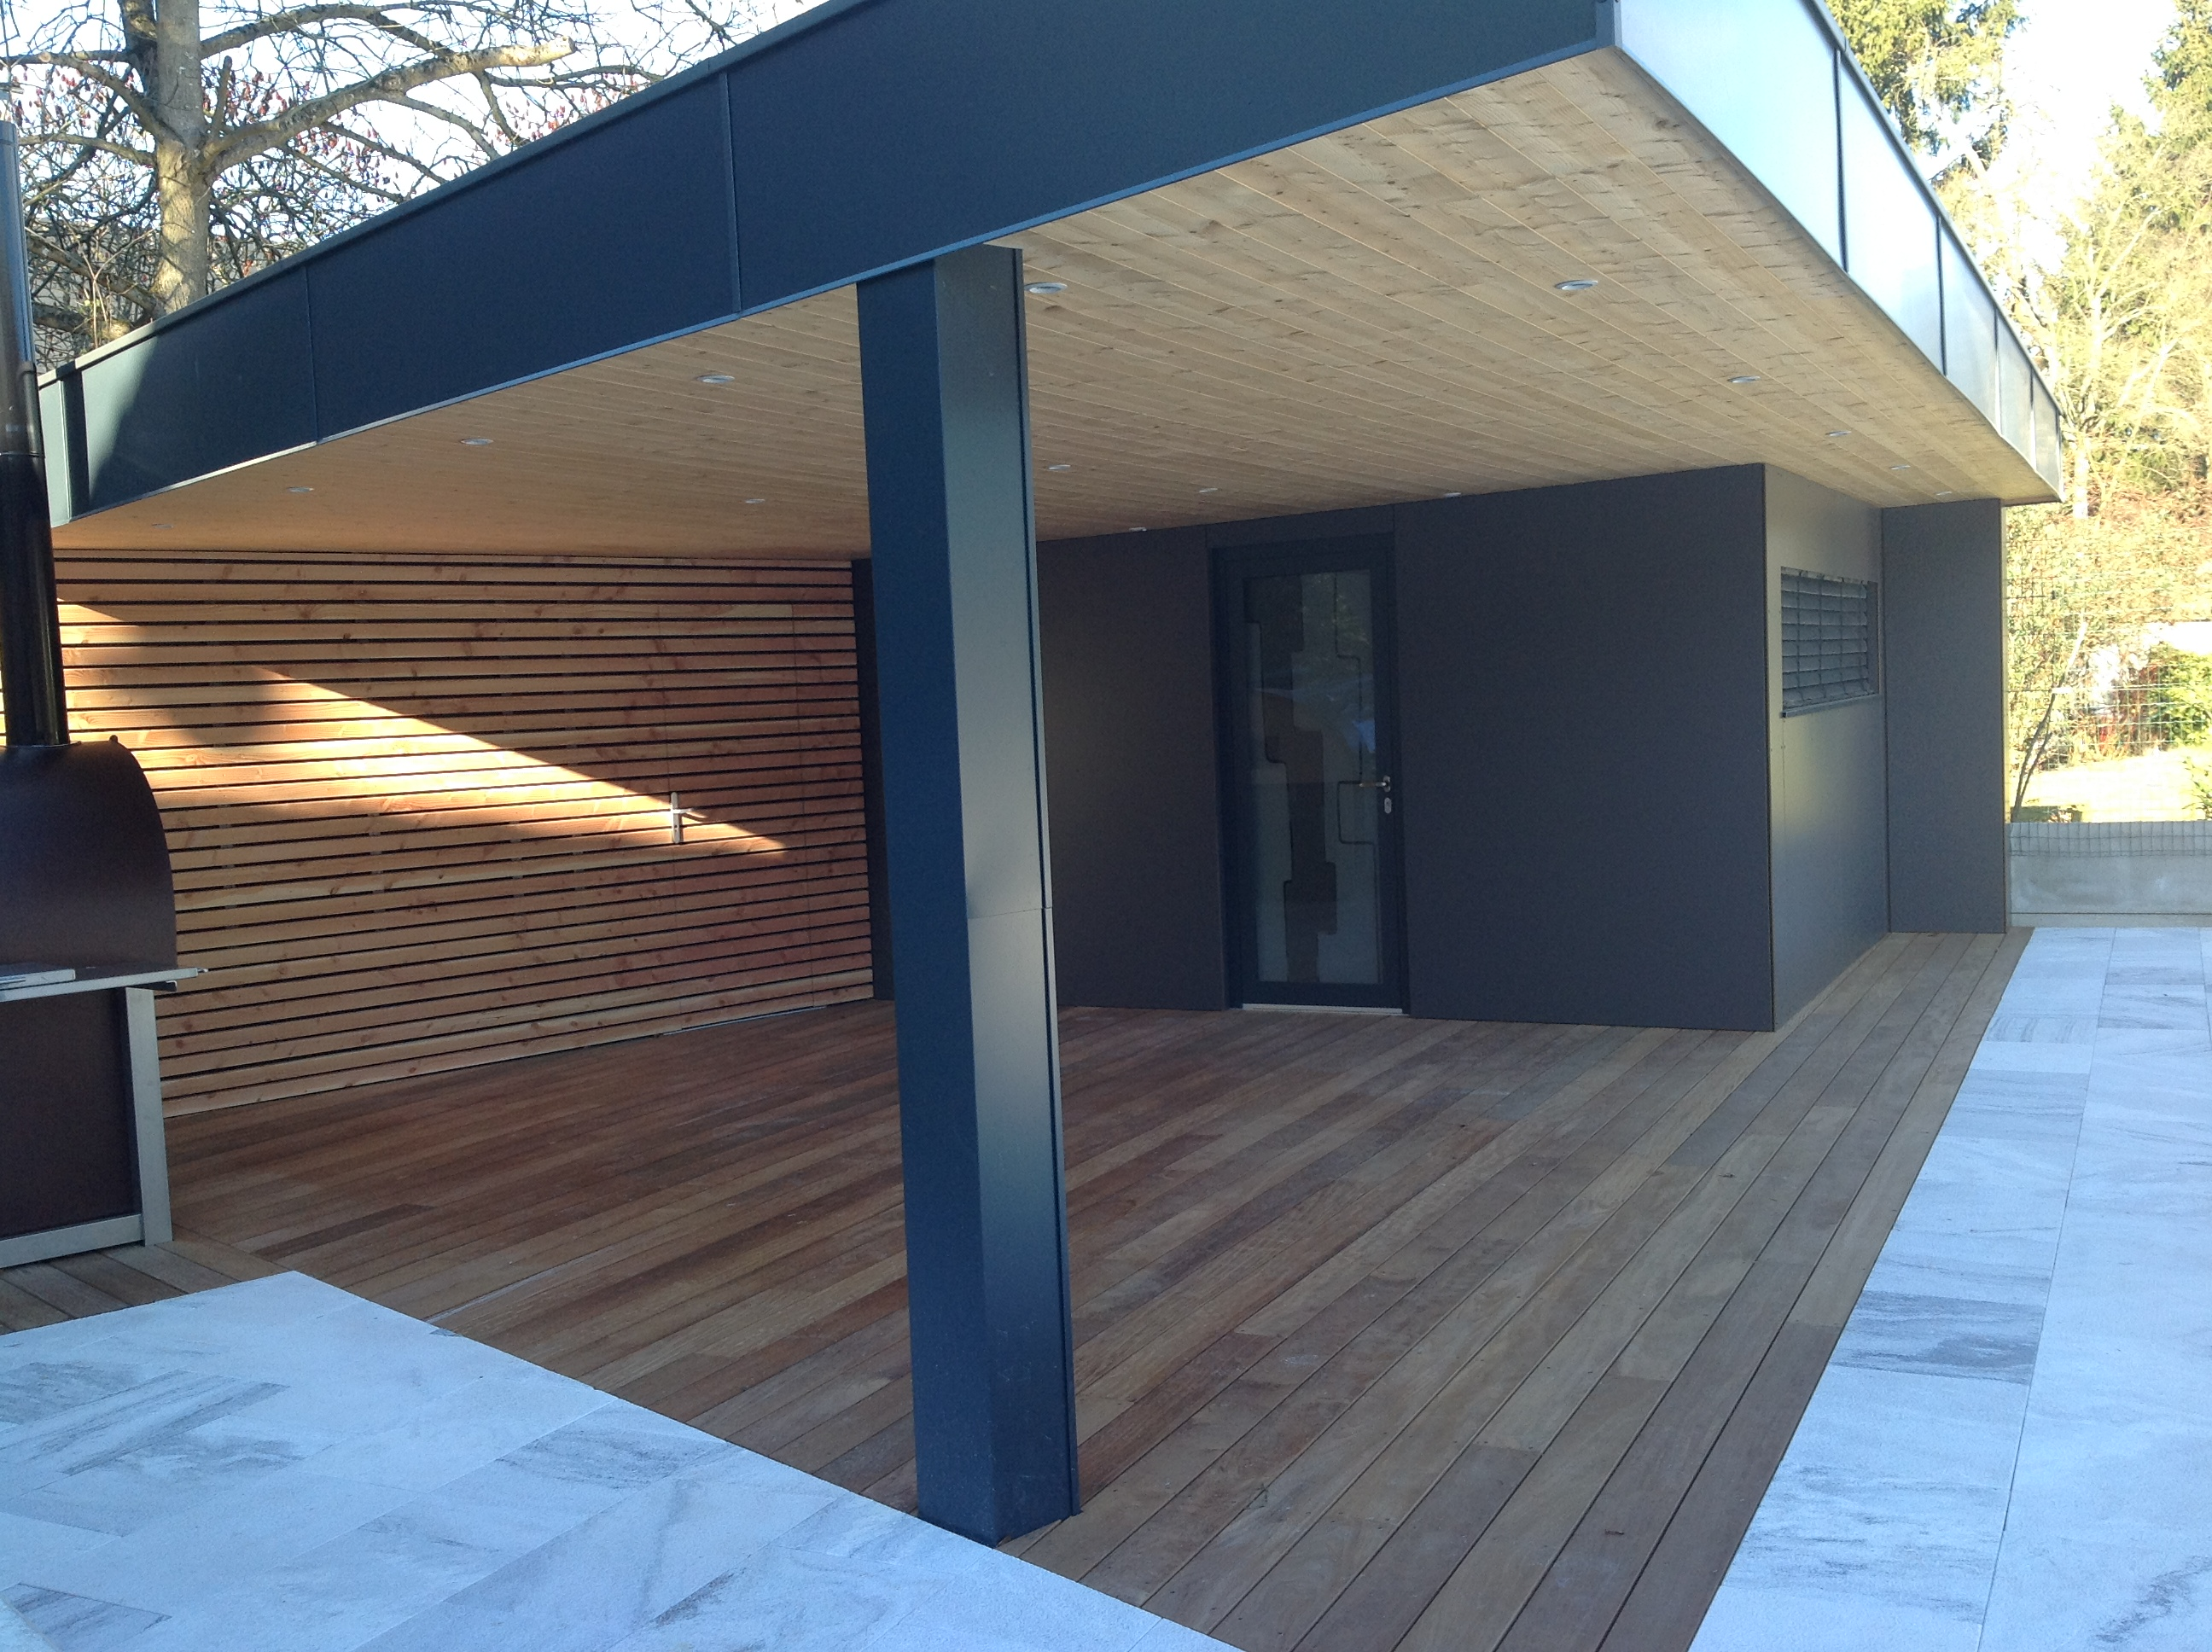 Terrasse bois ossature - Terrasse couverte bois ...